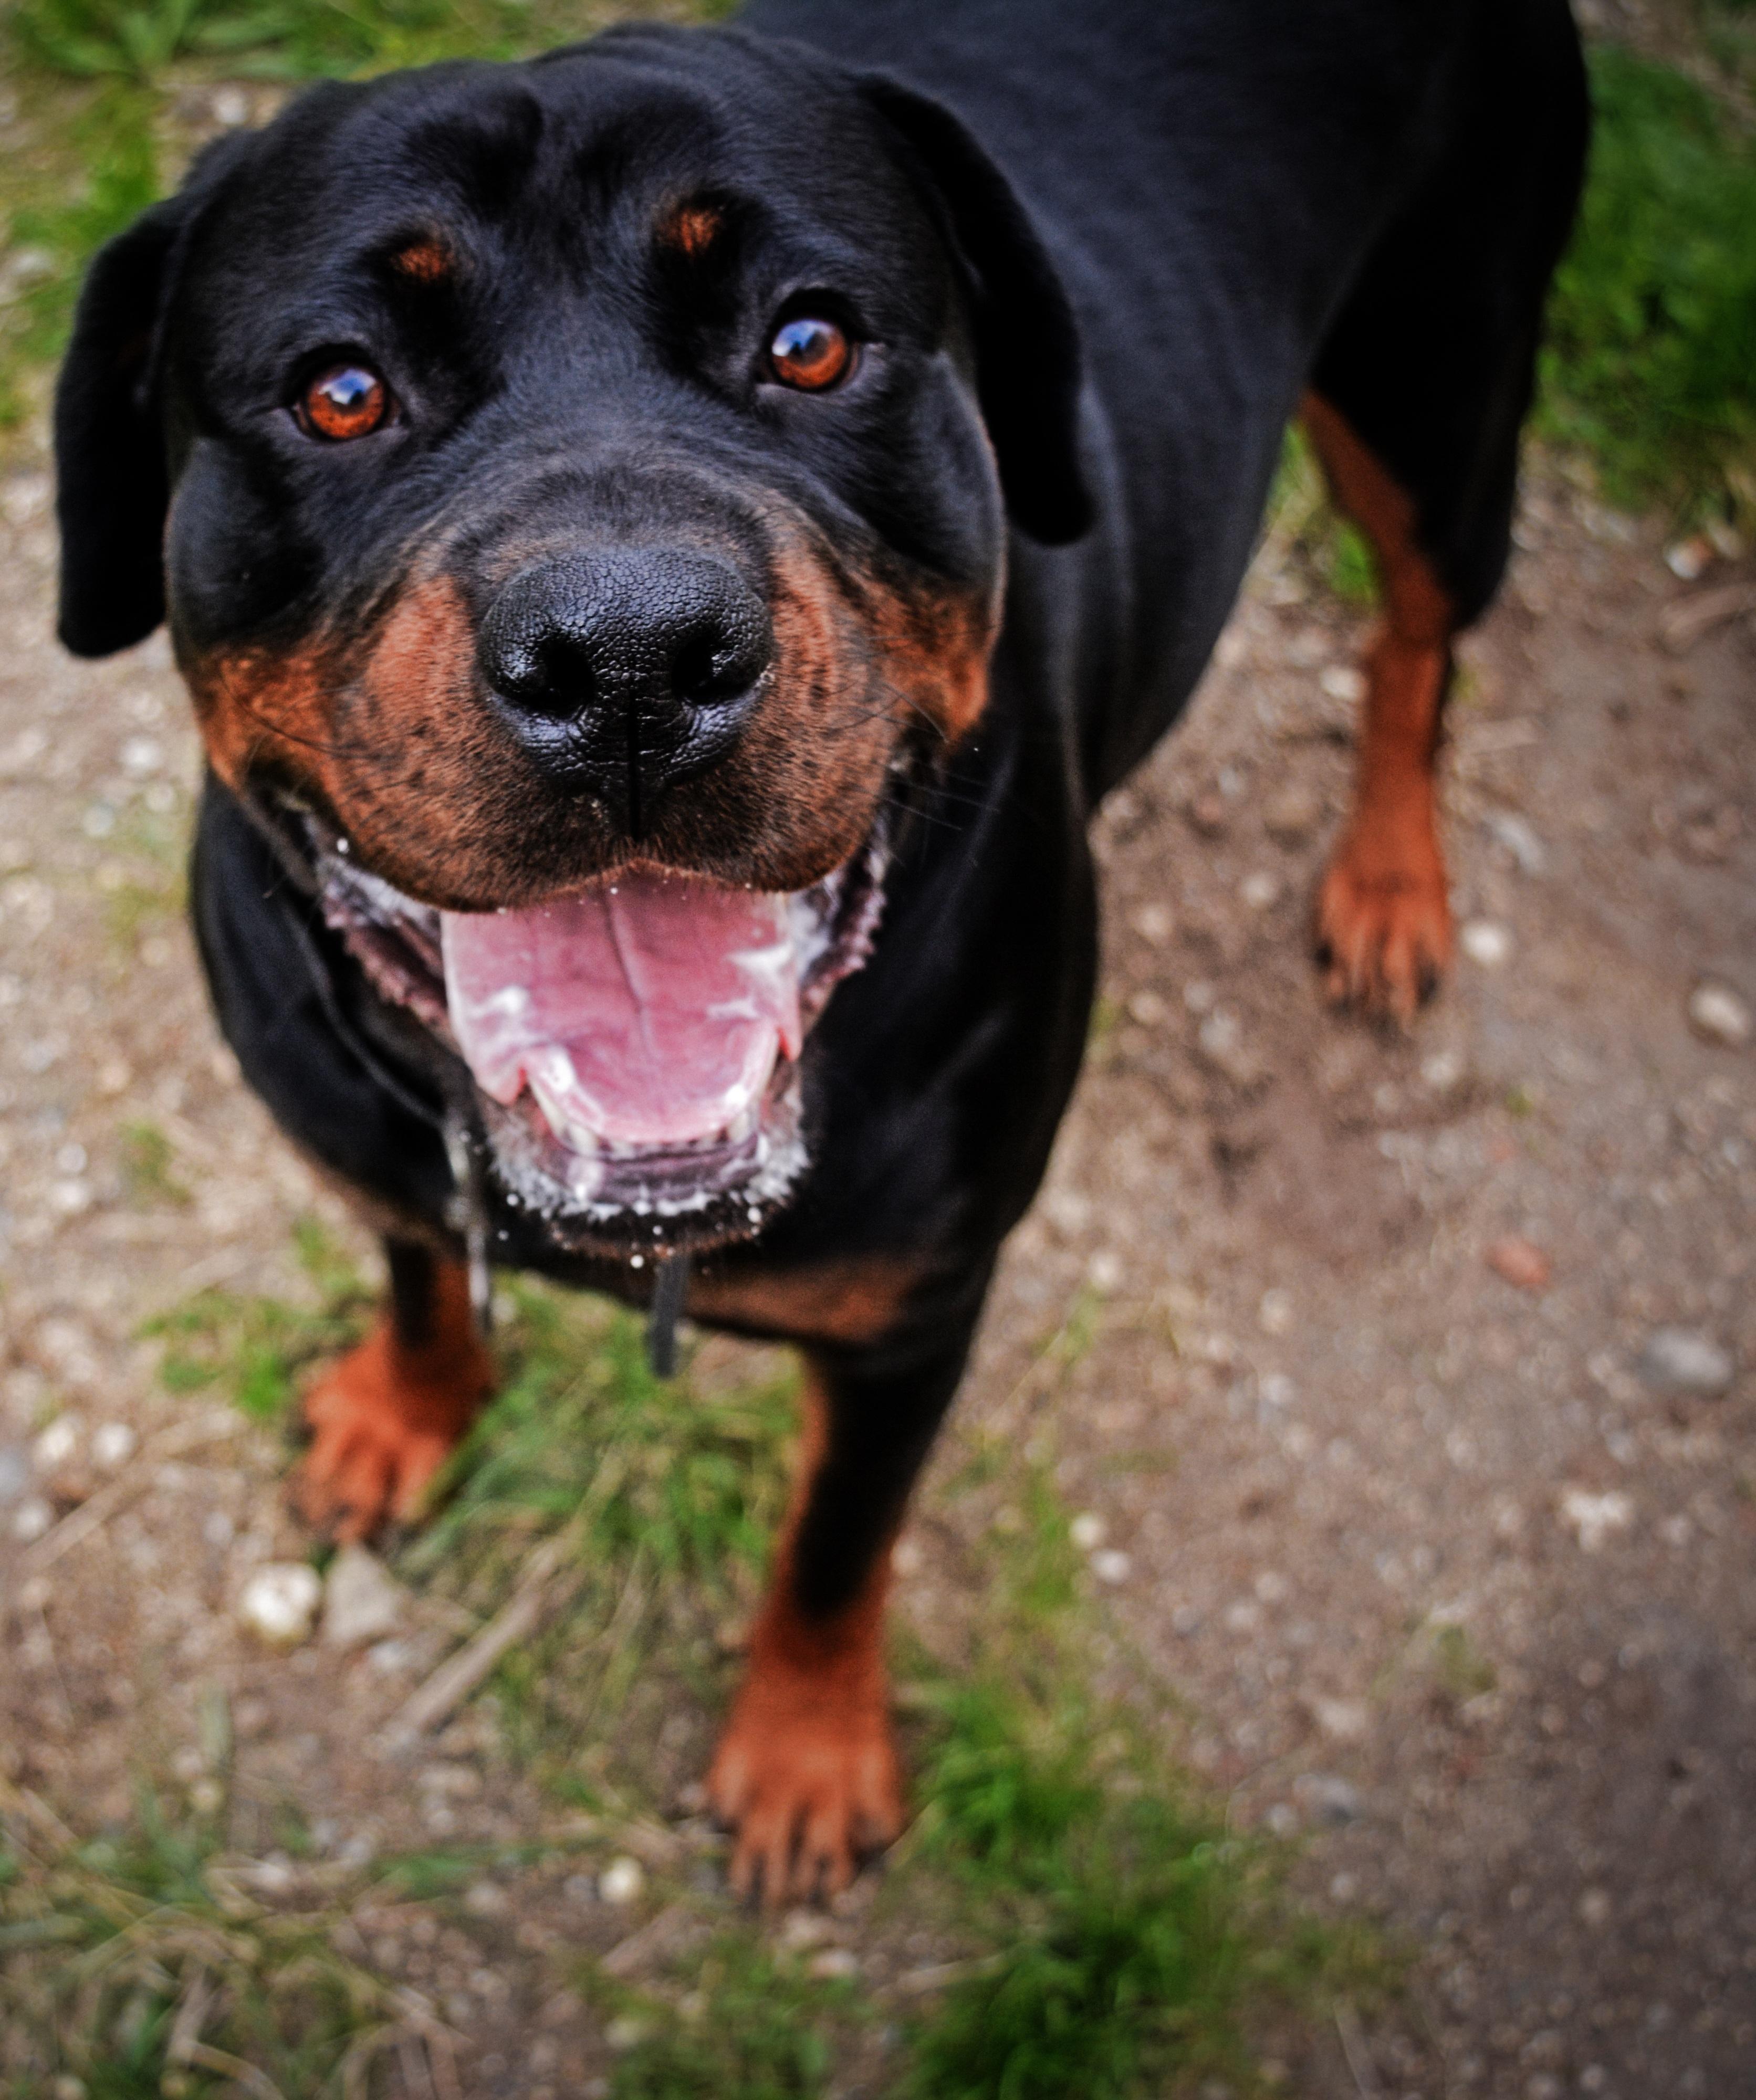 Gambar Binatang Menyusui Bertulang Belakang Jenis Anjing Rottweiler Anjing Seperti Mamalia Carnivora Austria Hound Hitam Dan Cokelat Anjing Pemburu Polandia Hound Transylvania Anjing Gunung Swiss Yang Lebih Besar Bergumam 3344x4000